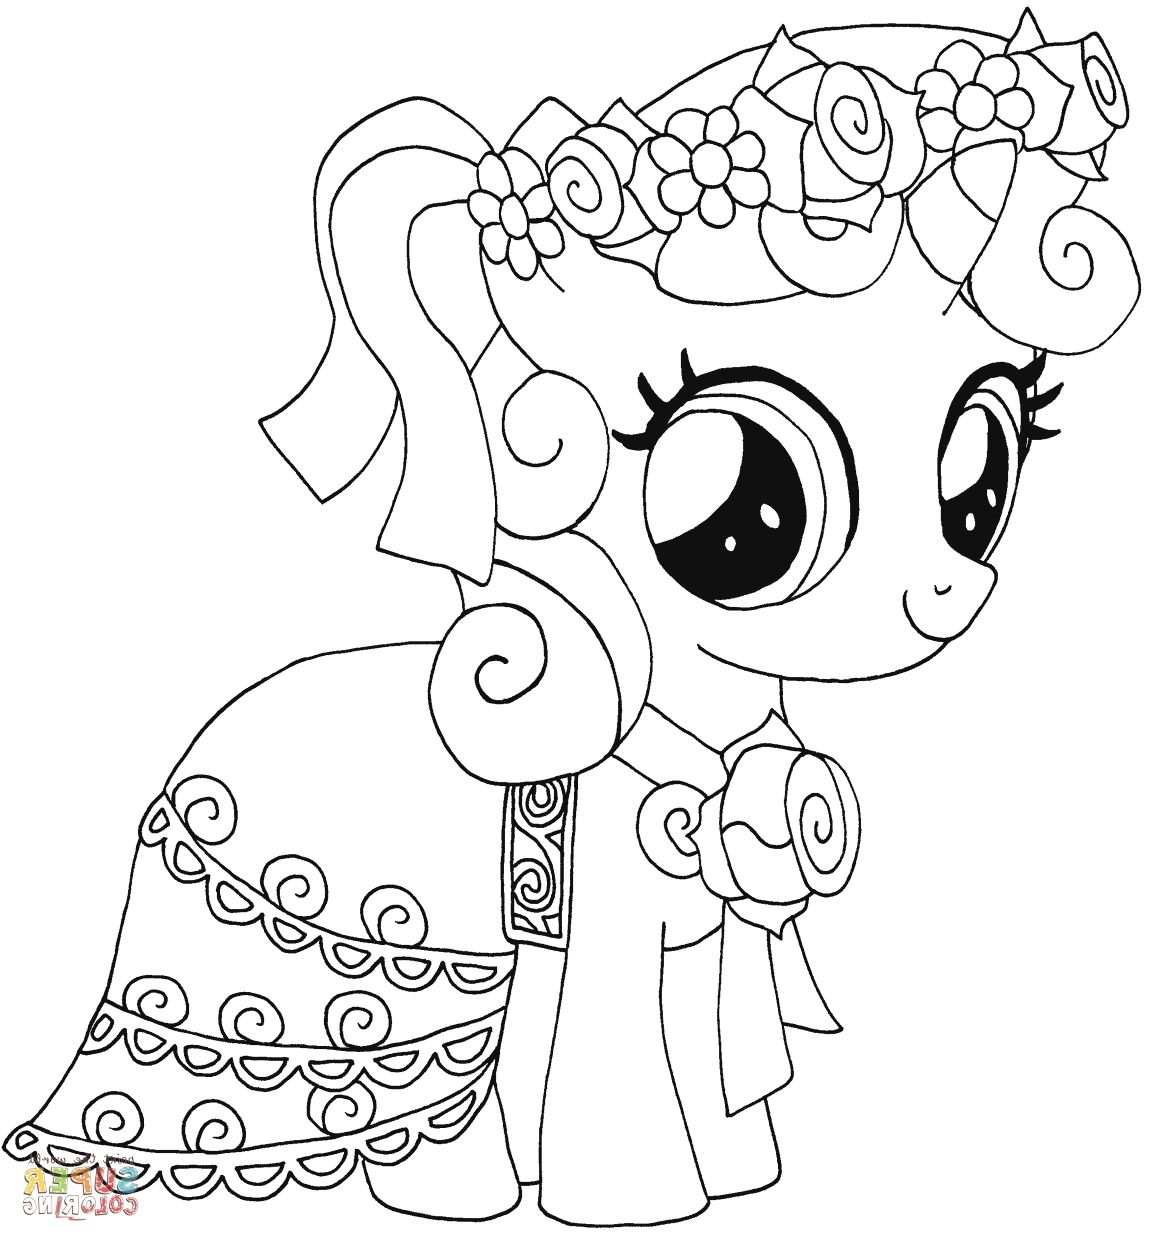 Mlp Coloring Pages My Little Pony Buku Mewarnai Gambar